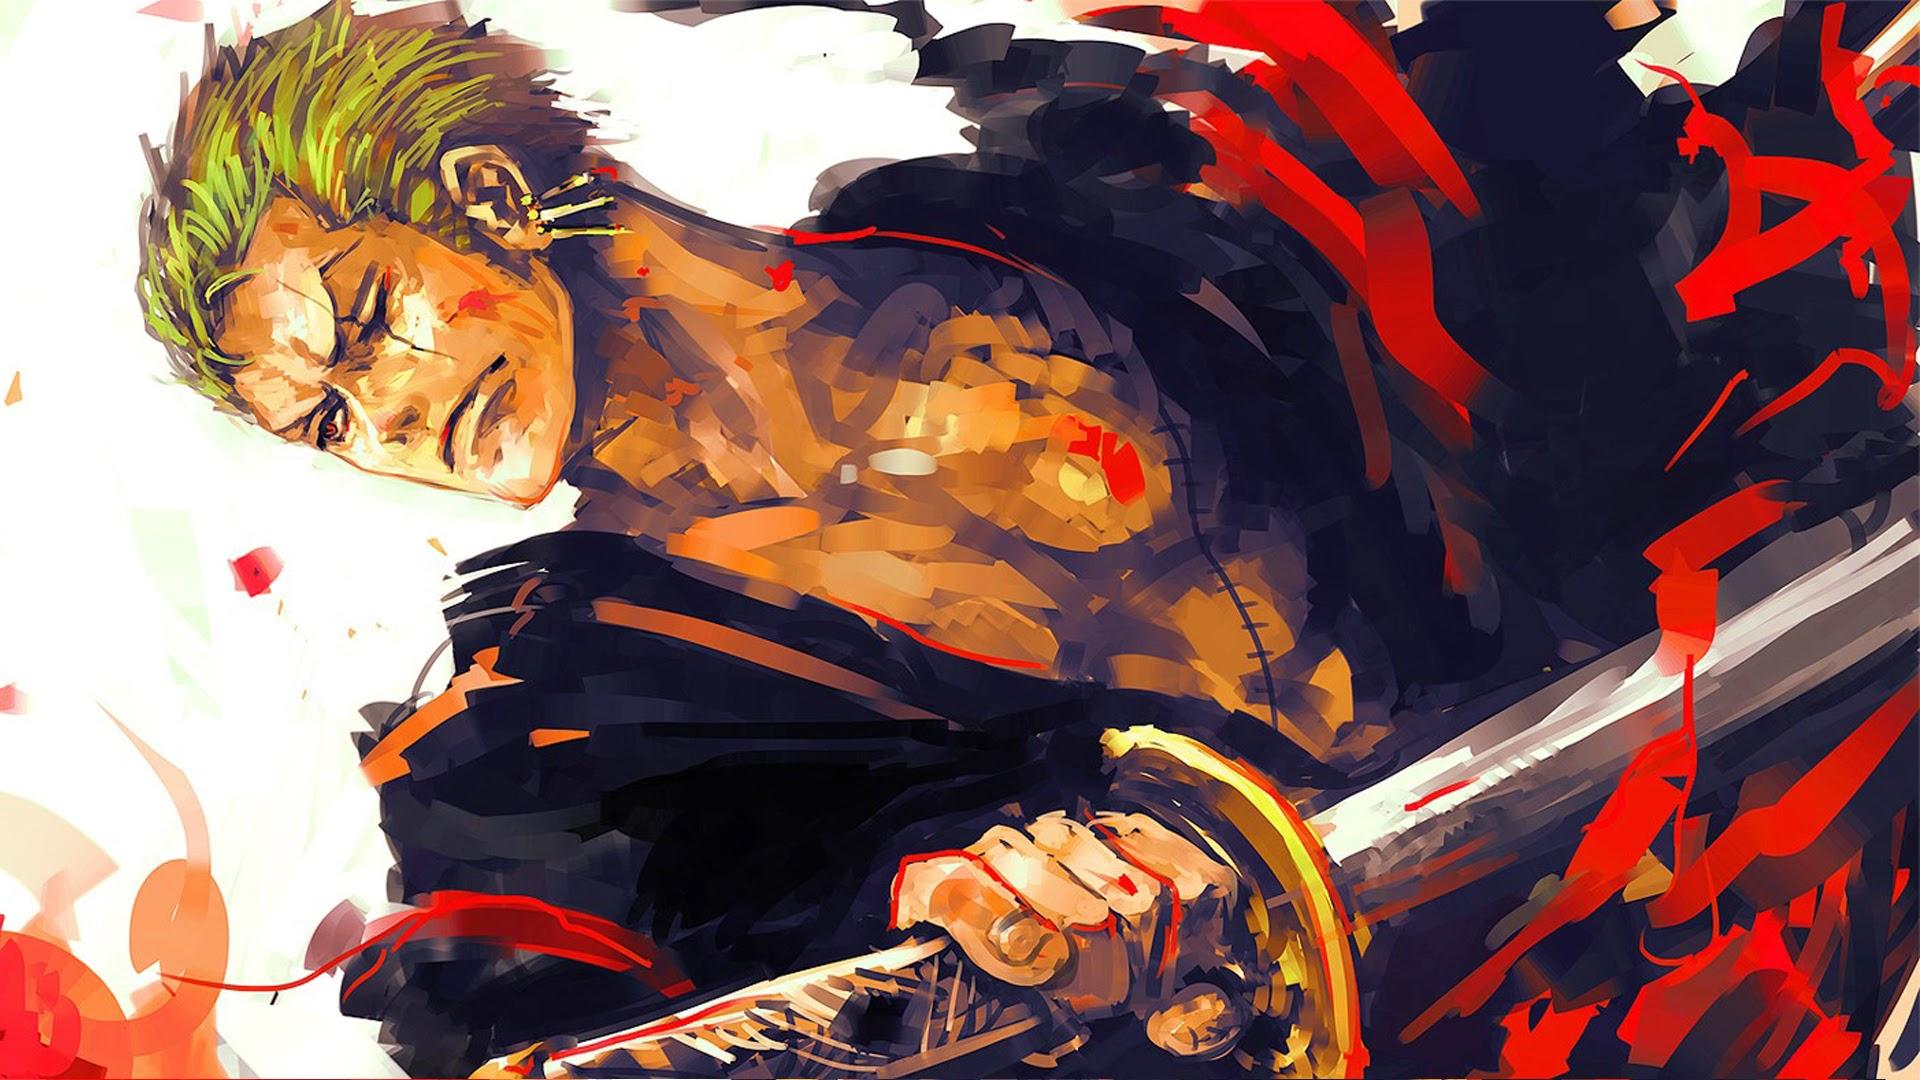 Roronoa Zoro HD Wallpaper | 1920x1080 | ID:51669